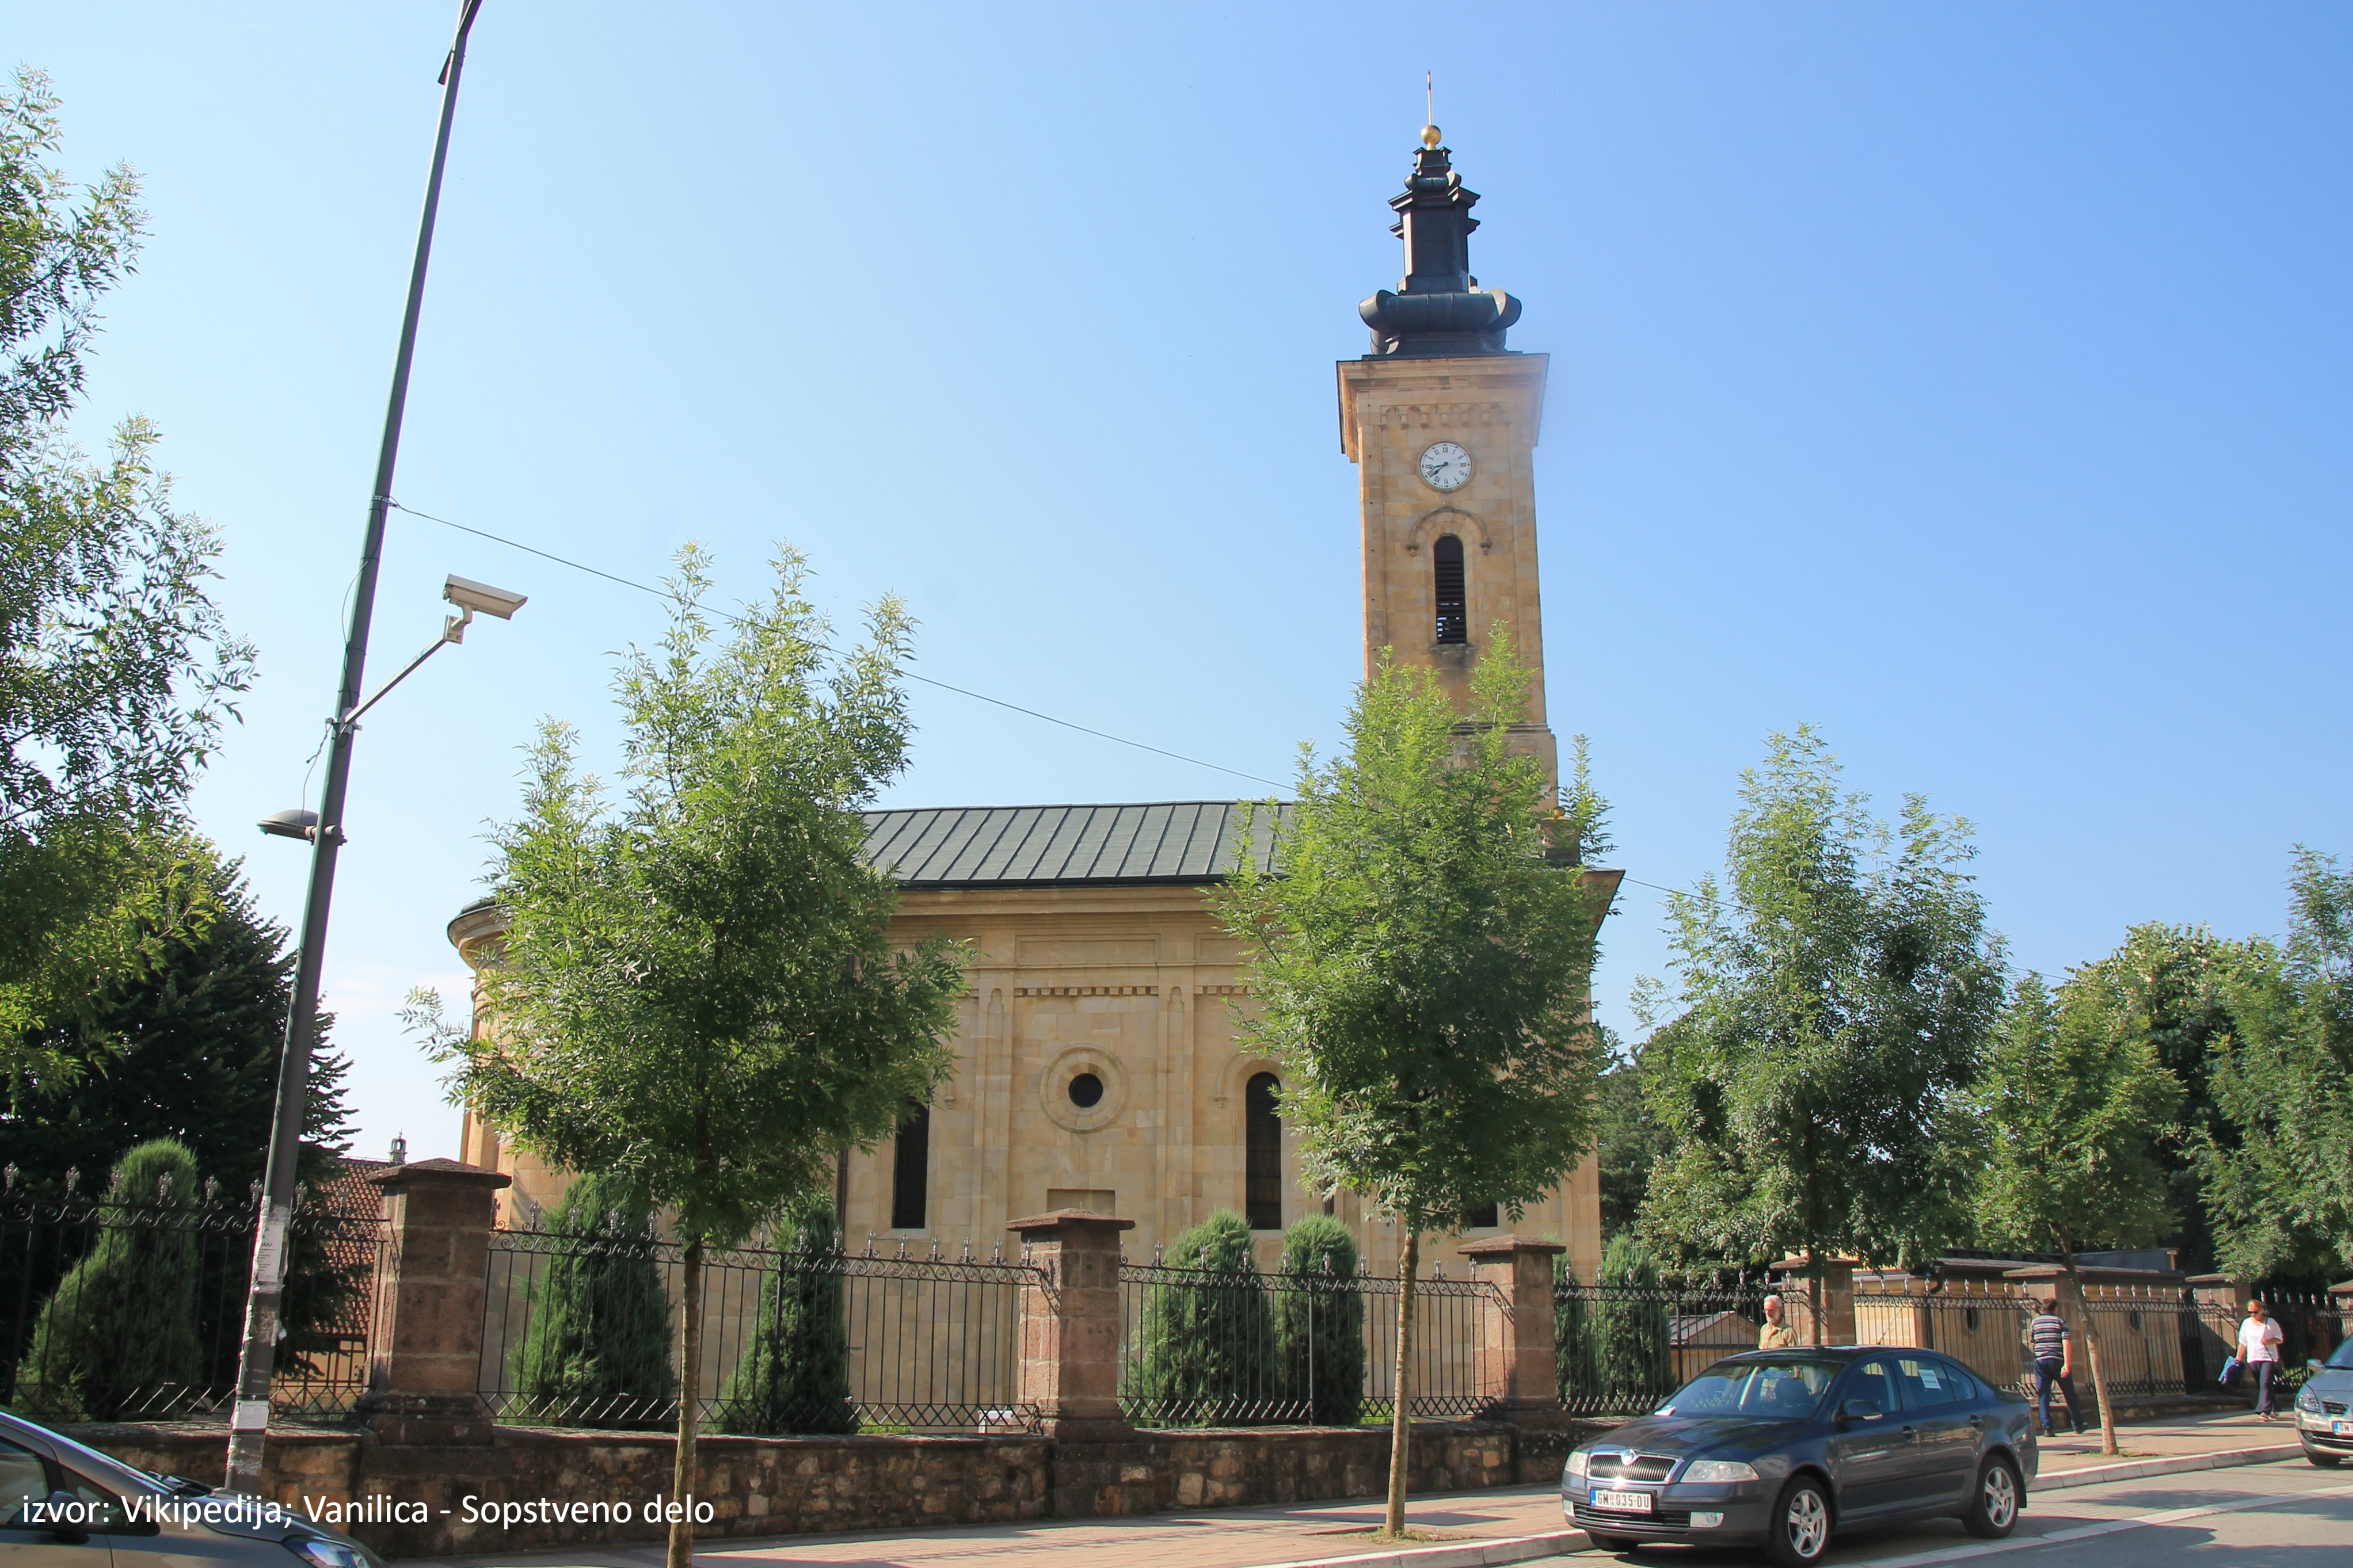 Wiki_Šumadija_VII_Crkva_Svete_Trojice_(Gornji_Milanovac)_955 (1)